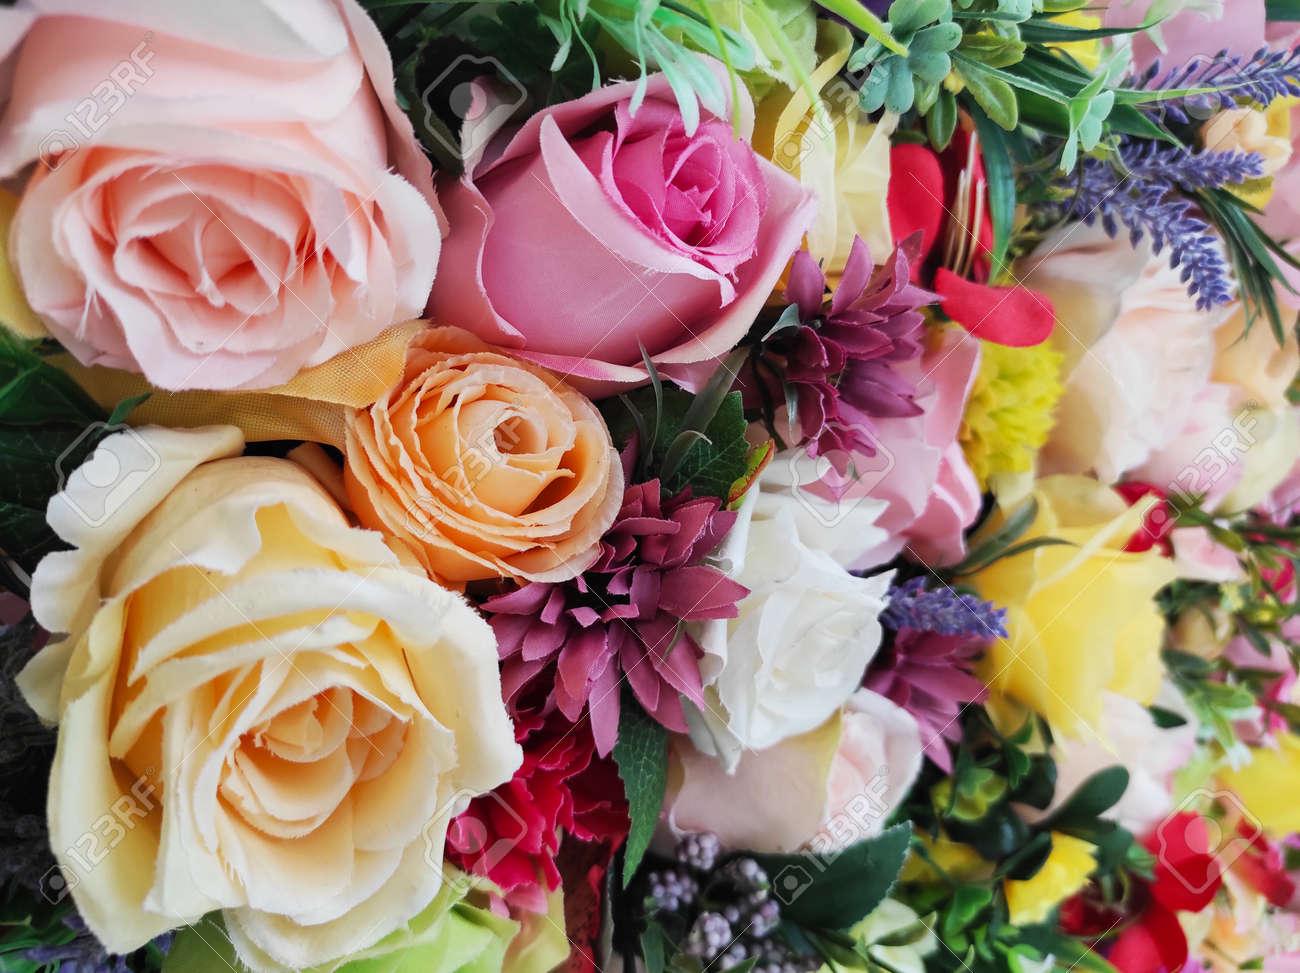 flower arrangements - 155645362